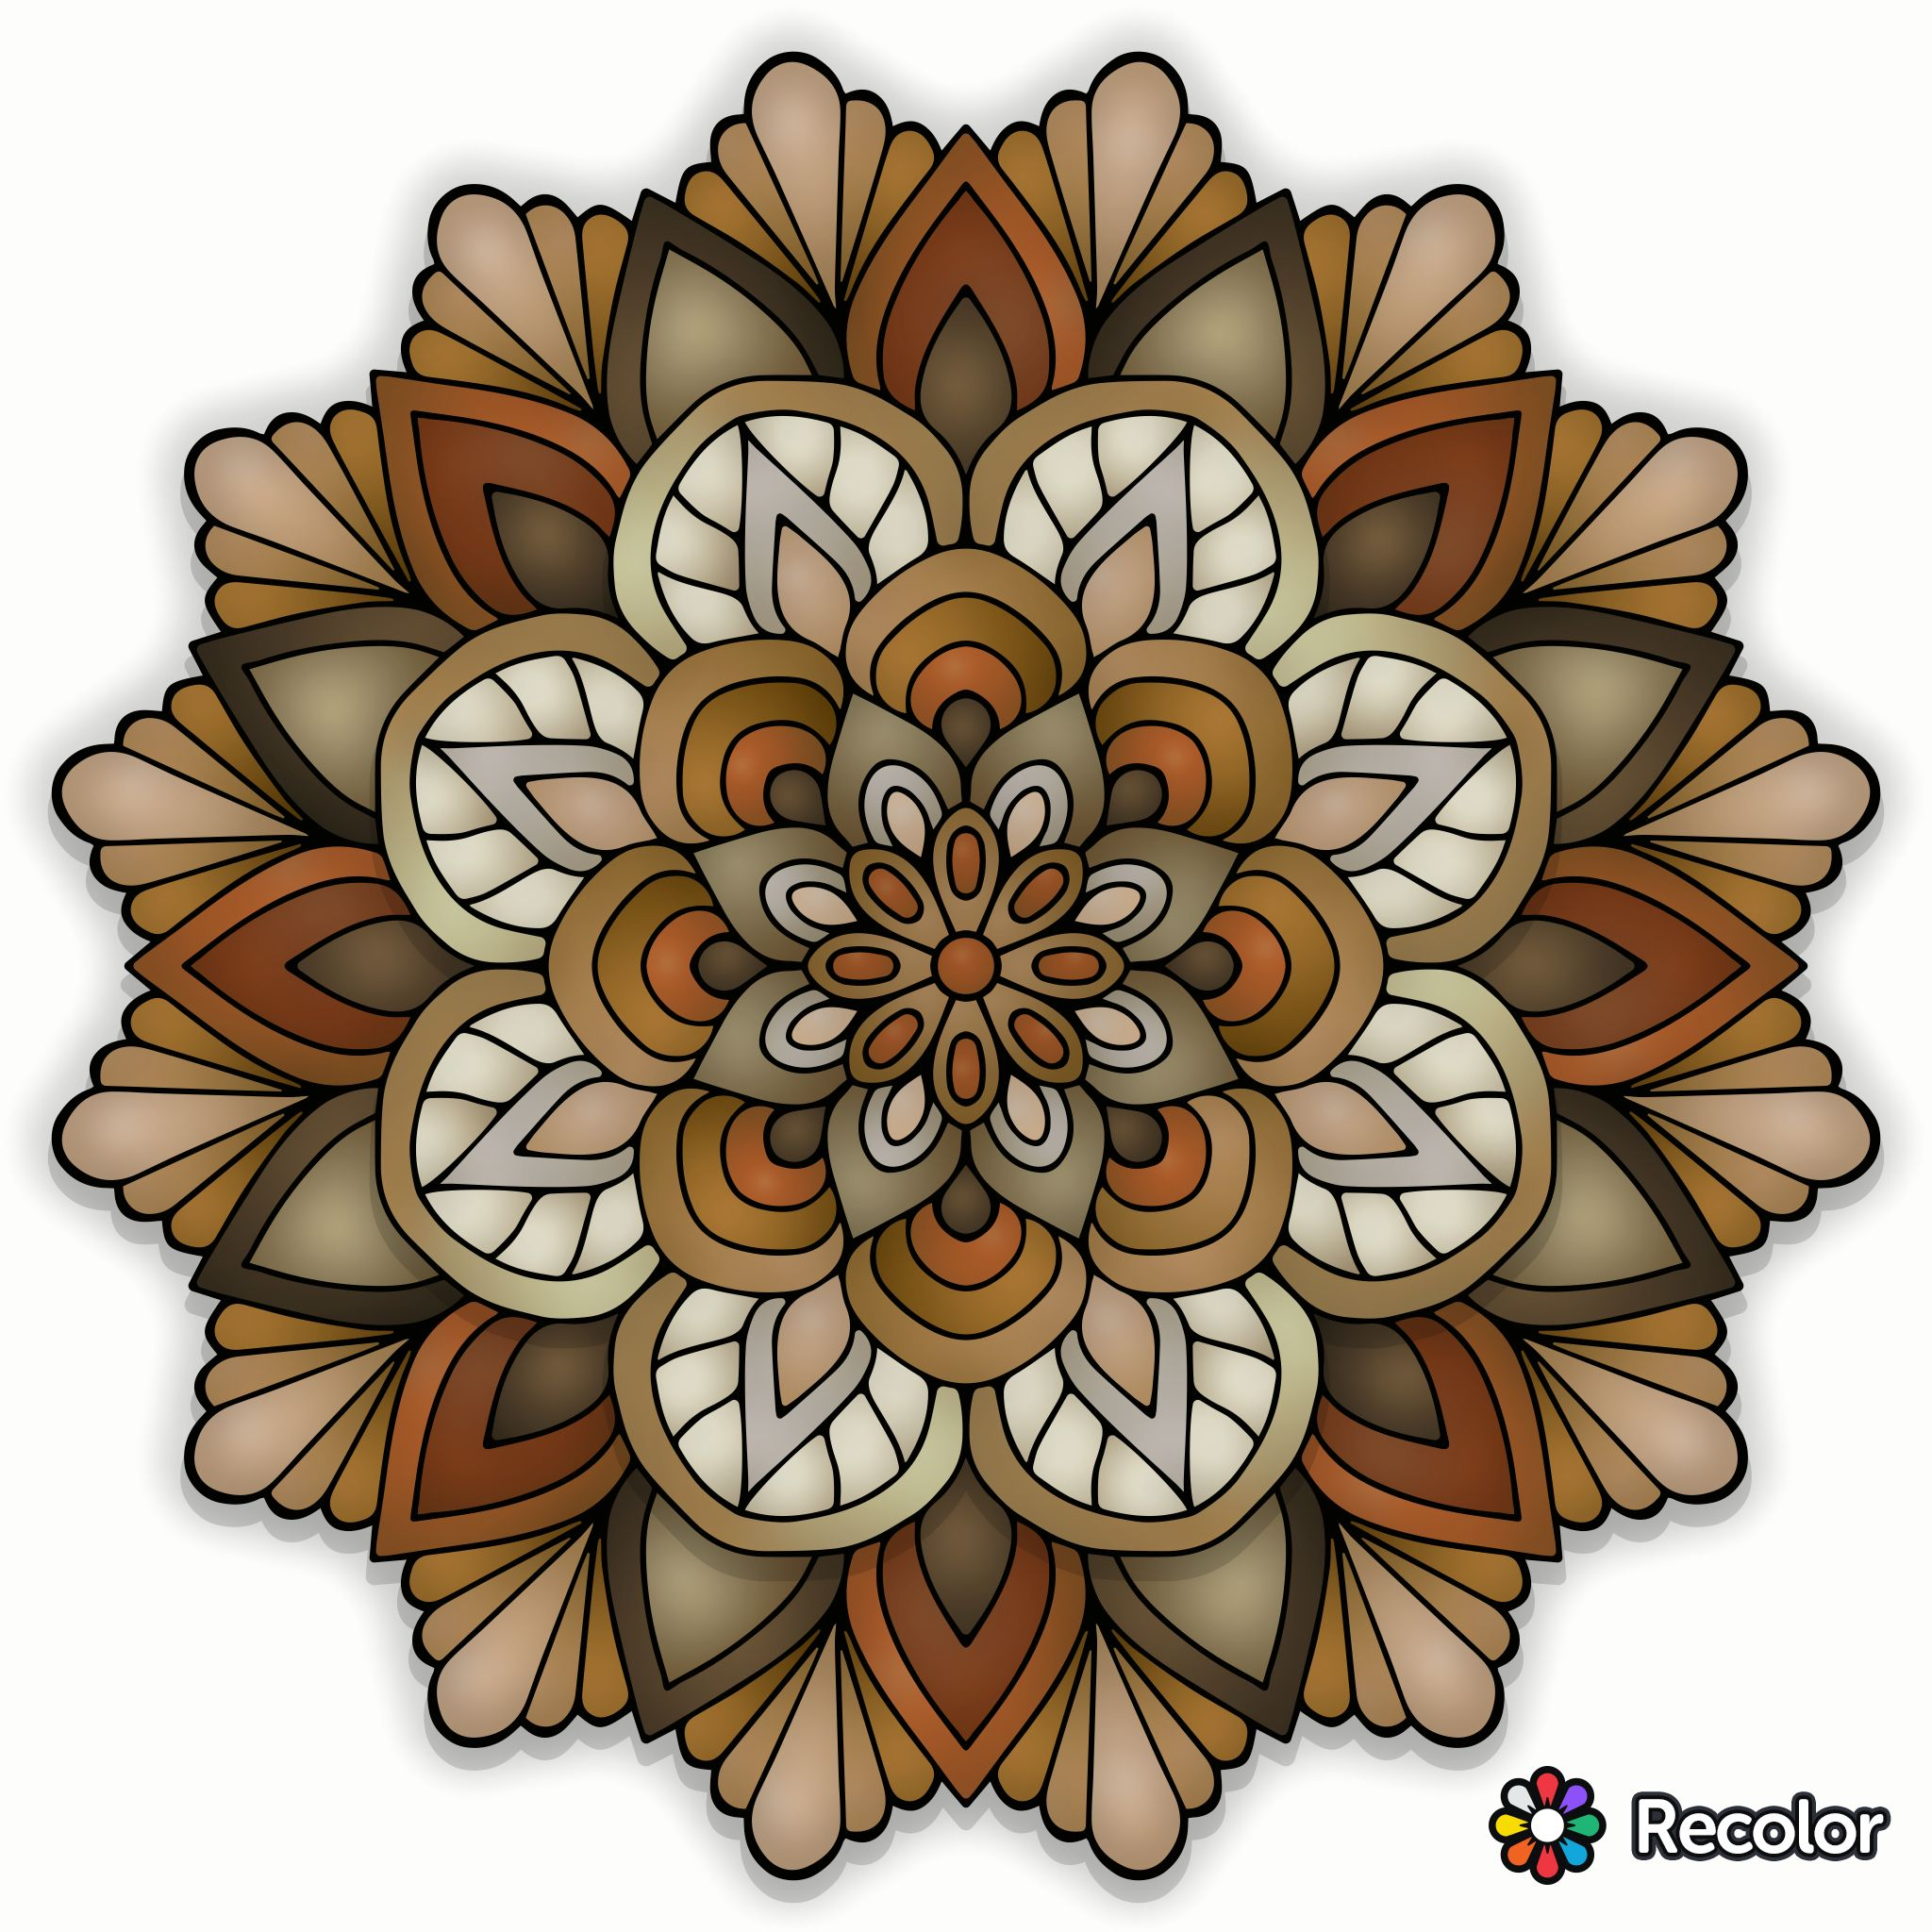 Pin de pat en Coloring pages | Pinterest | Pintura tela, Mandalas y ...